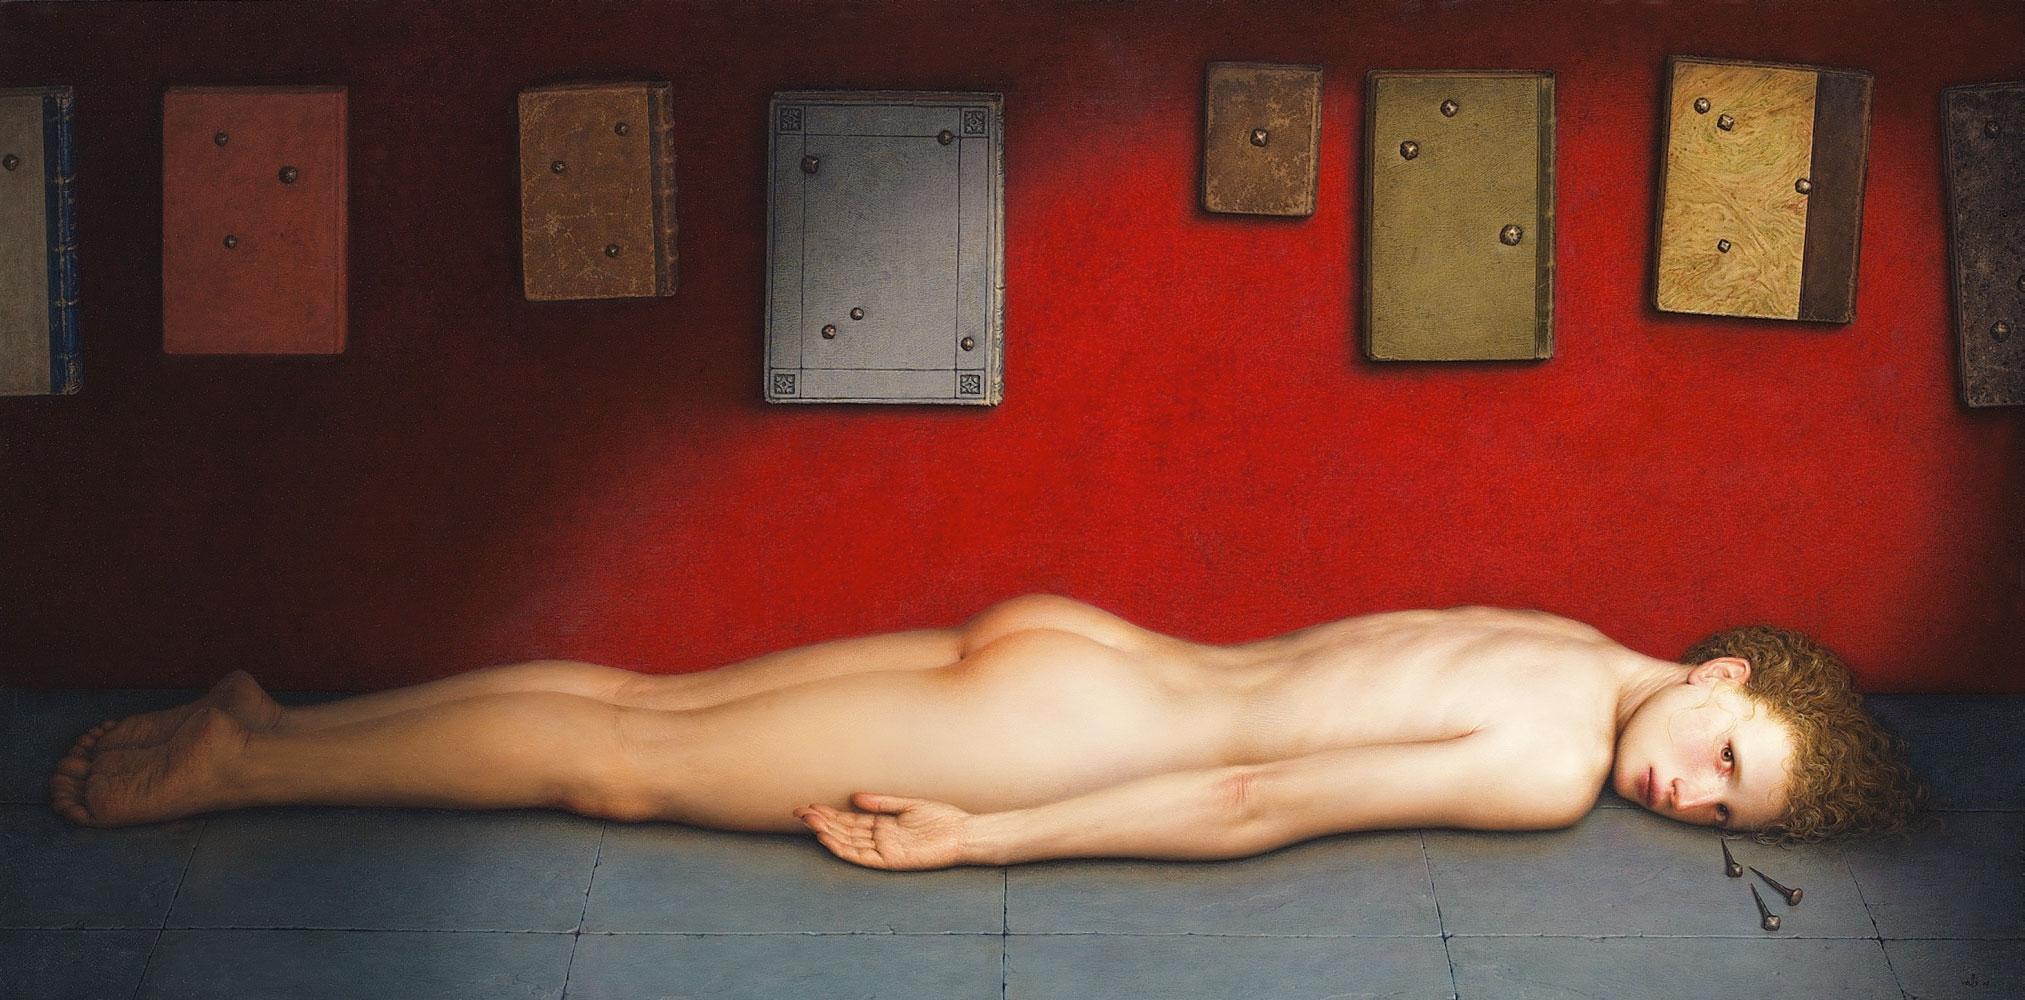 dino valls @ minimal exposition